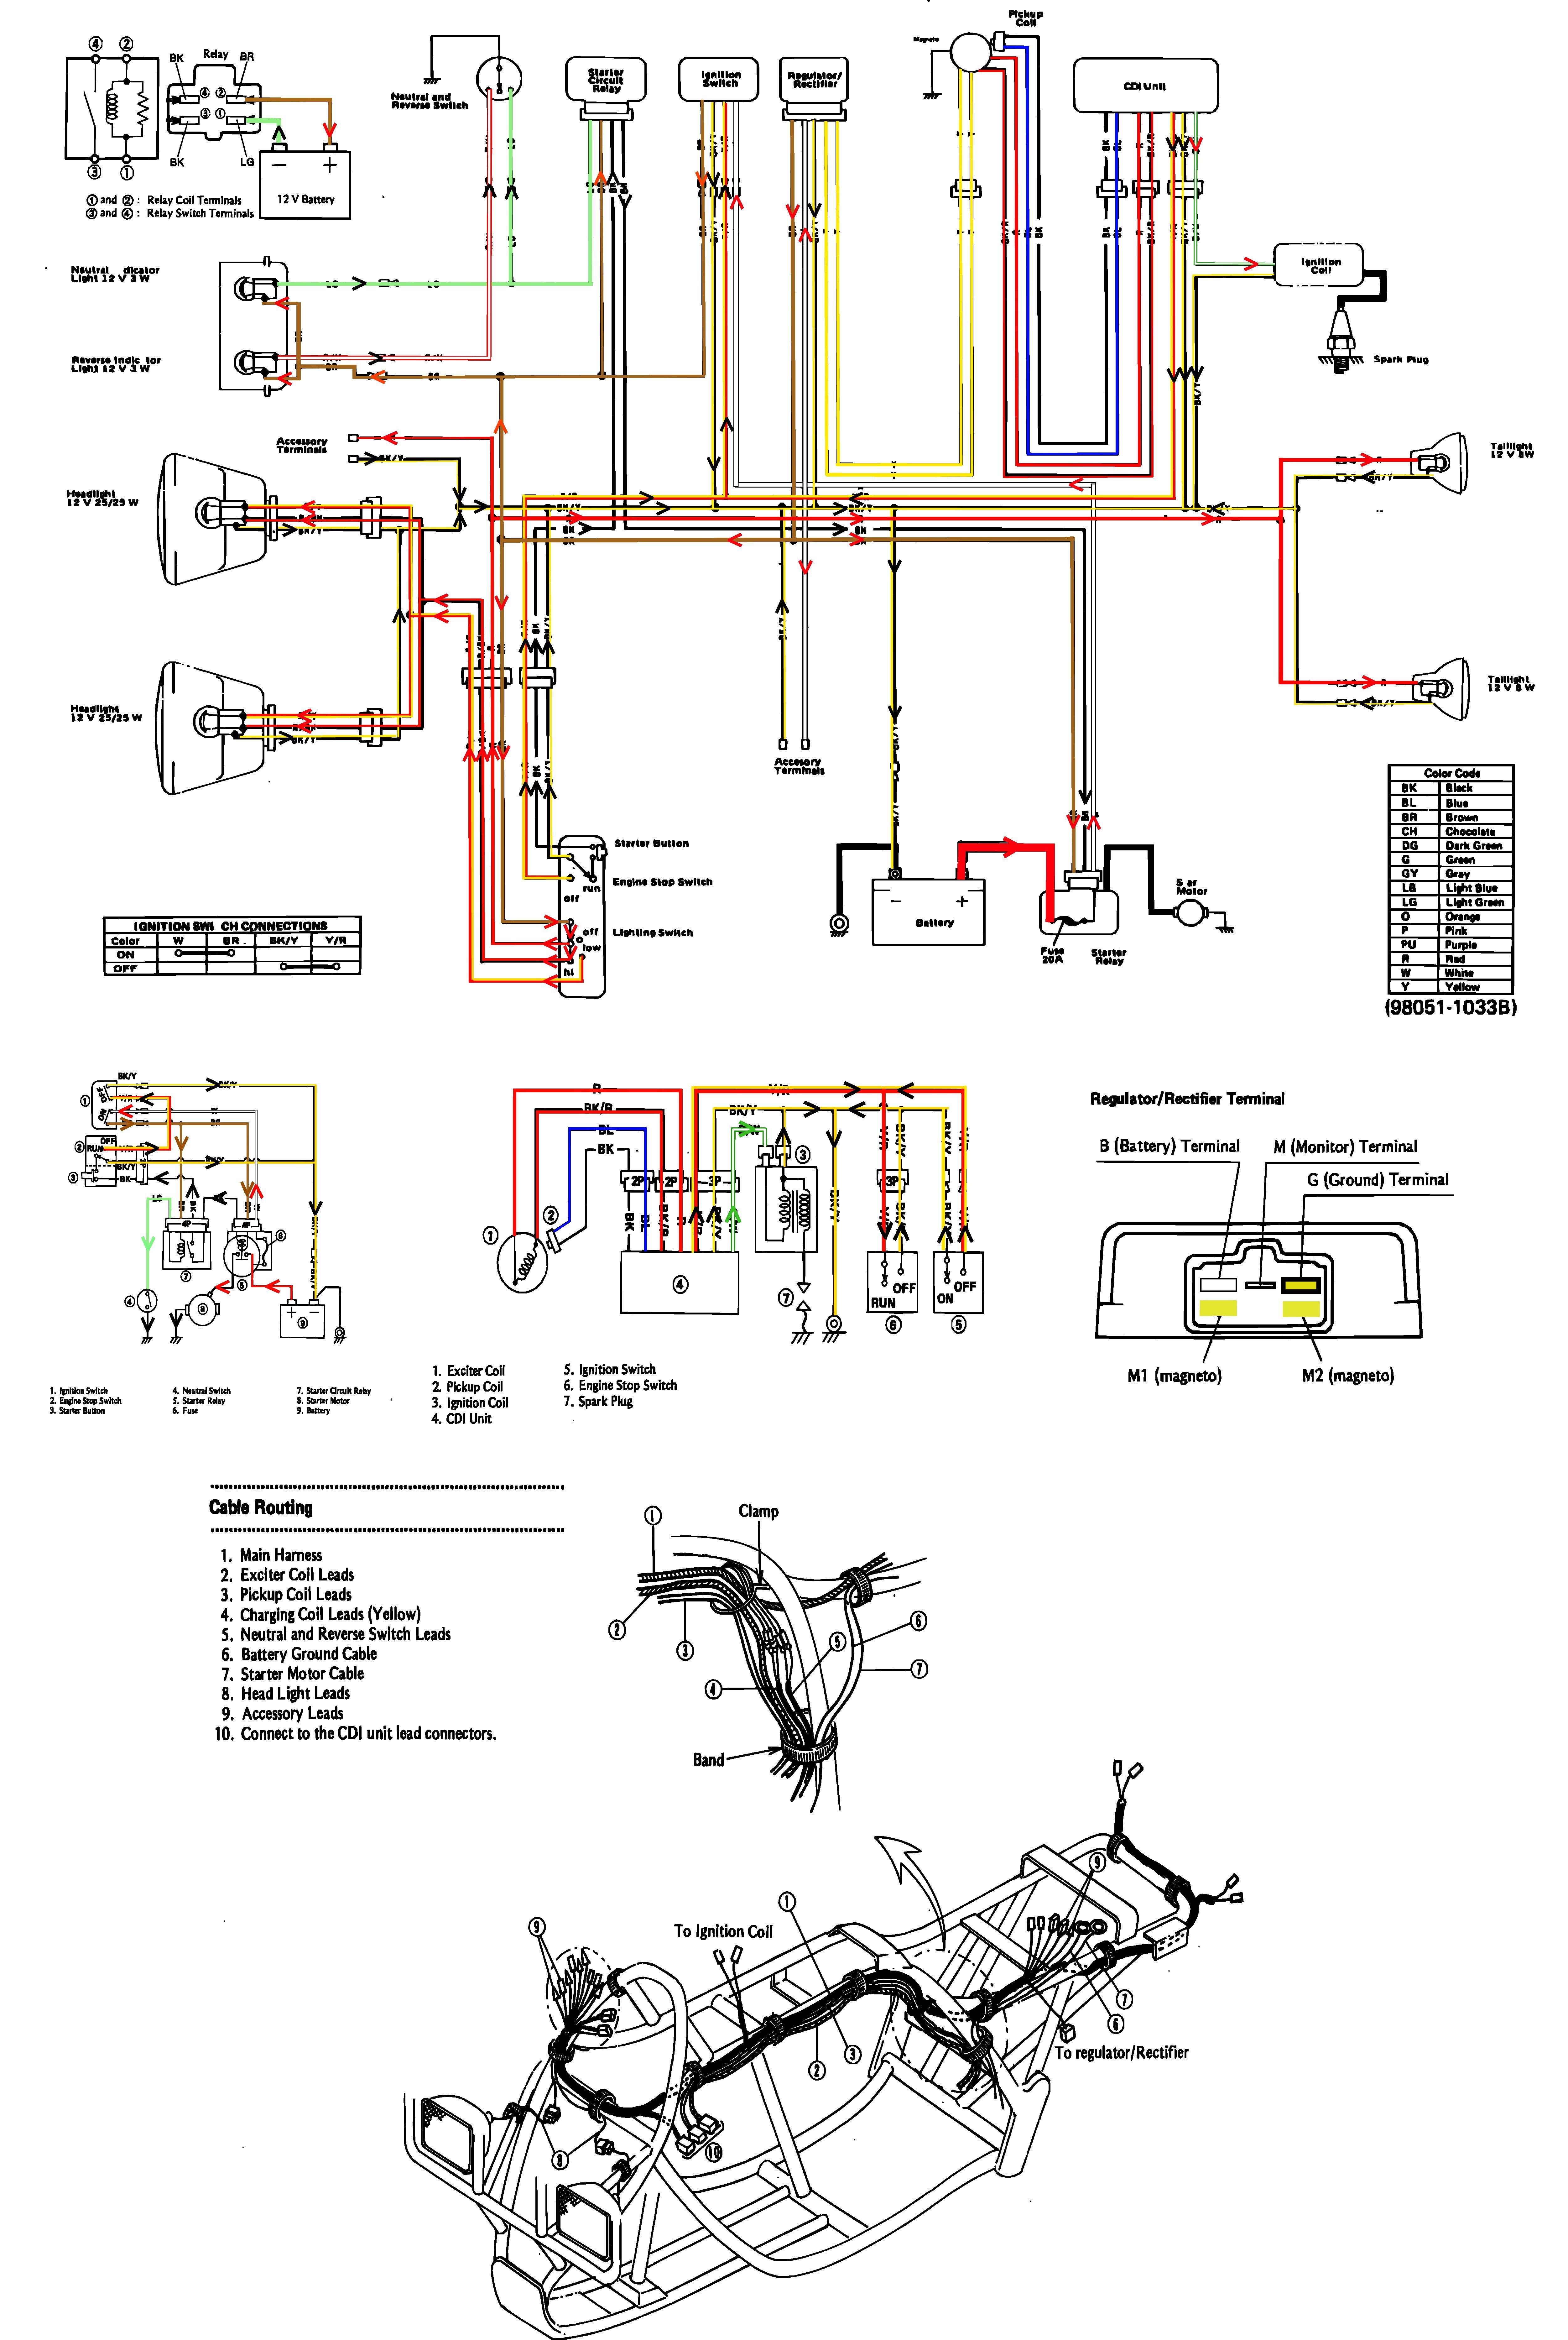 kawasaki 1988 KLF220A1 Bayou Wiring Diagram | Atvs | Atv